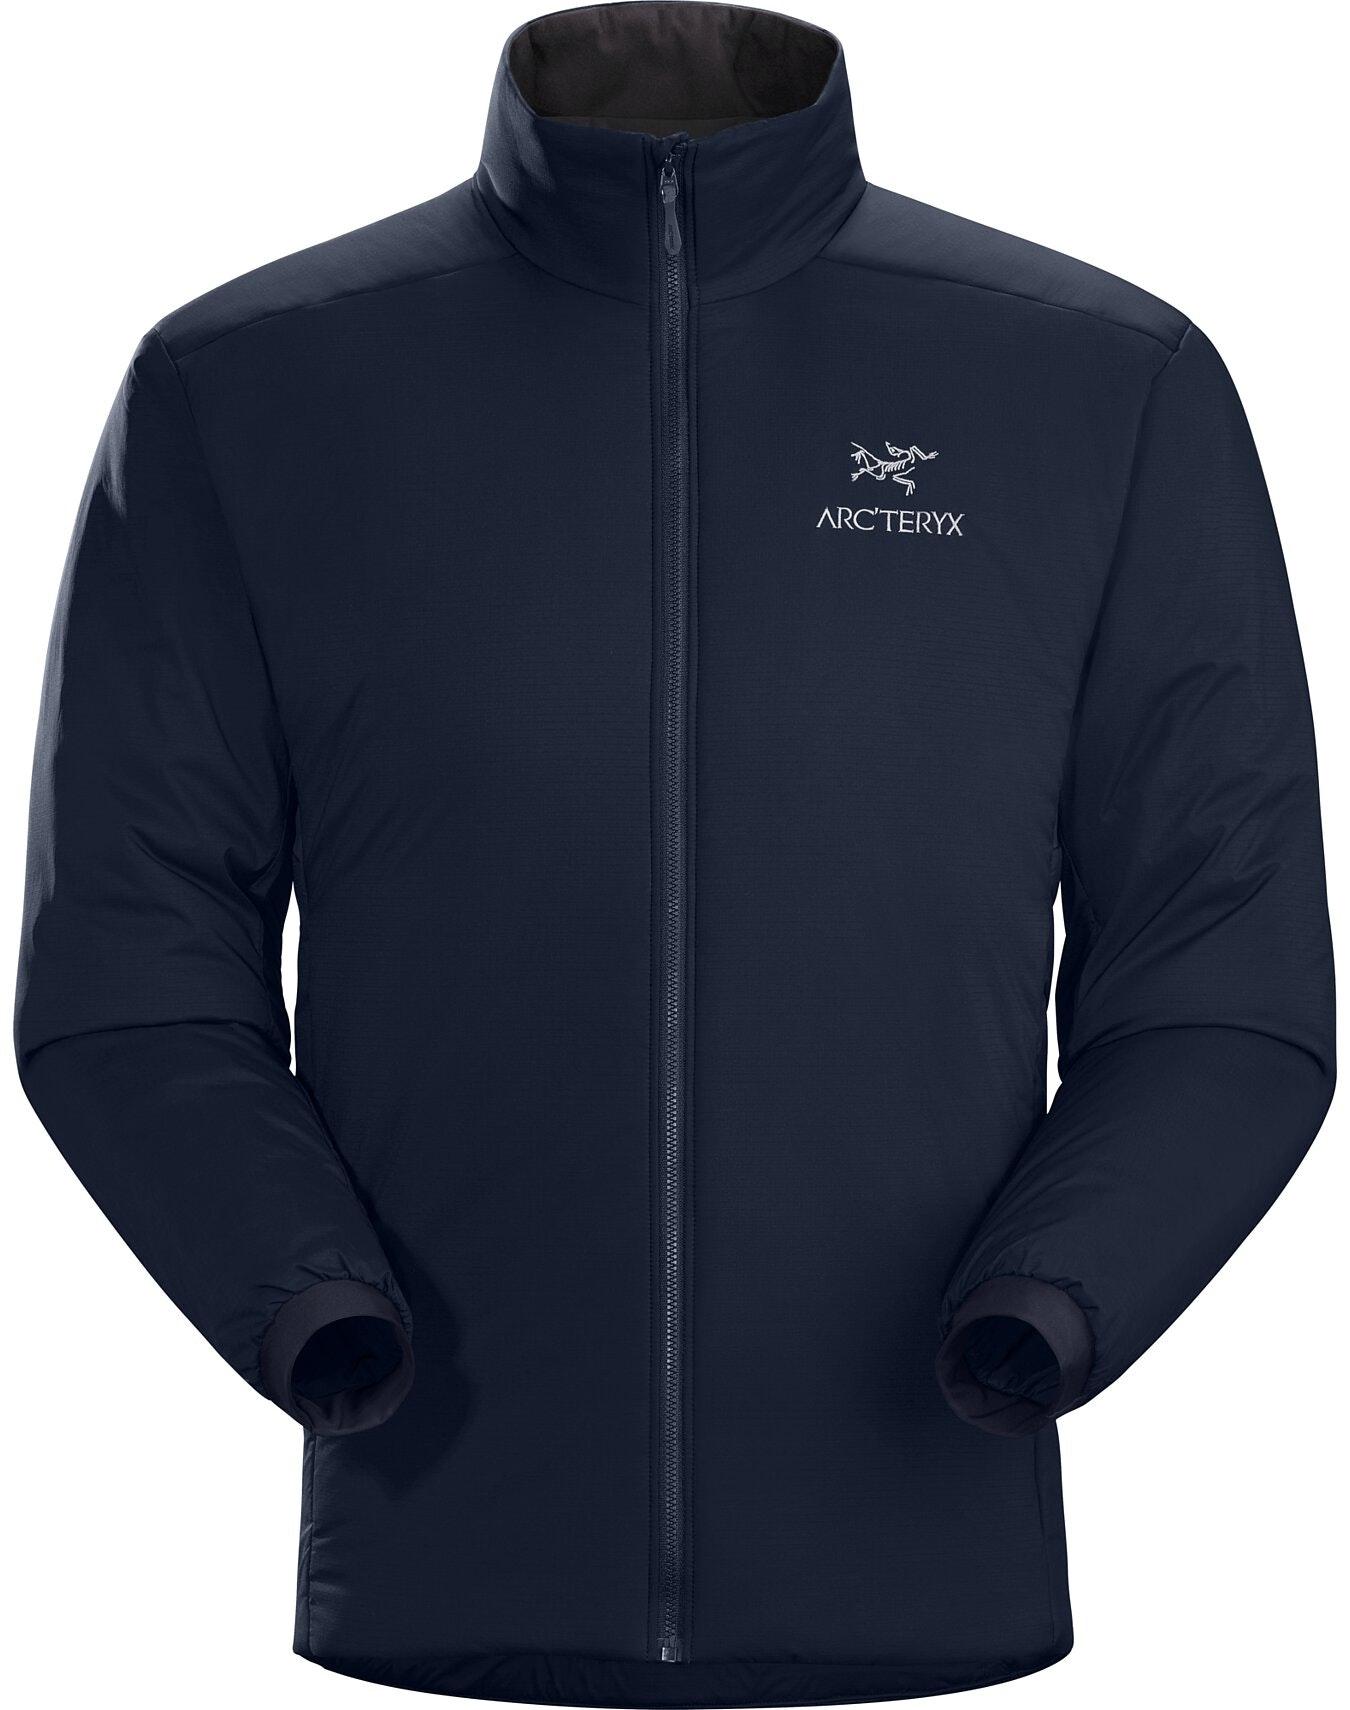 Atom AR Jacket Kingfisher